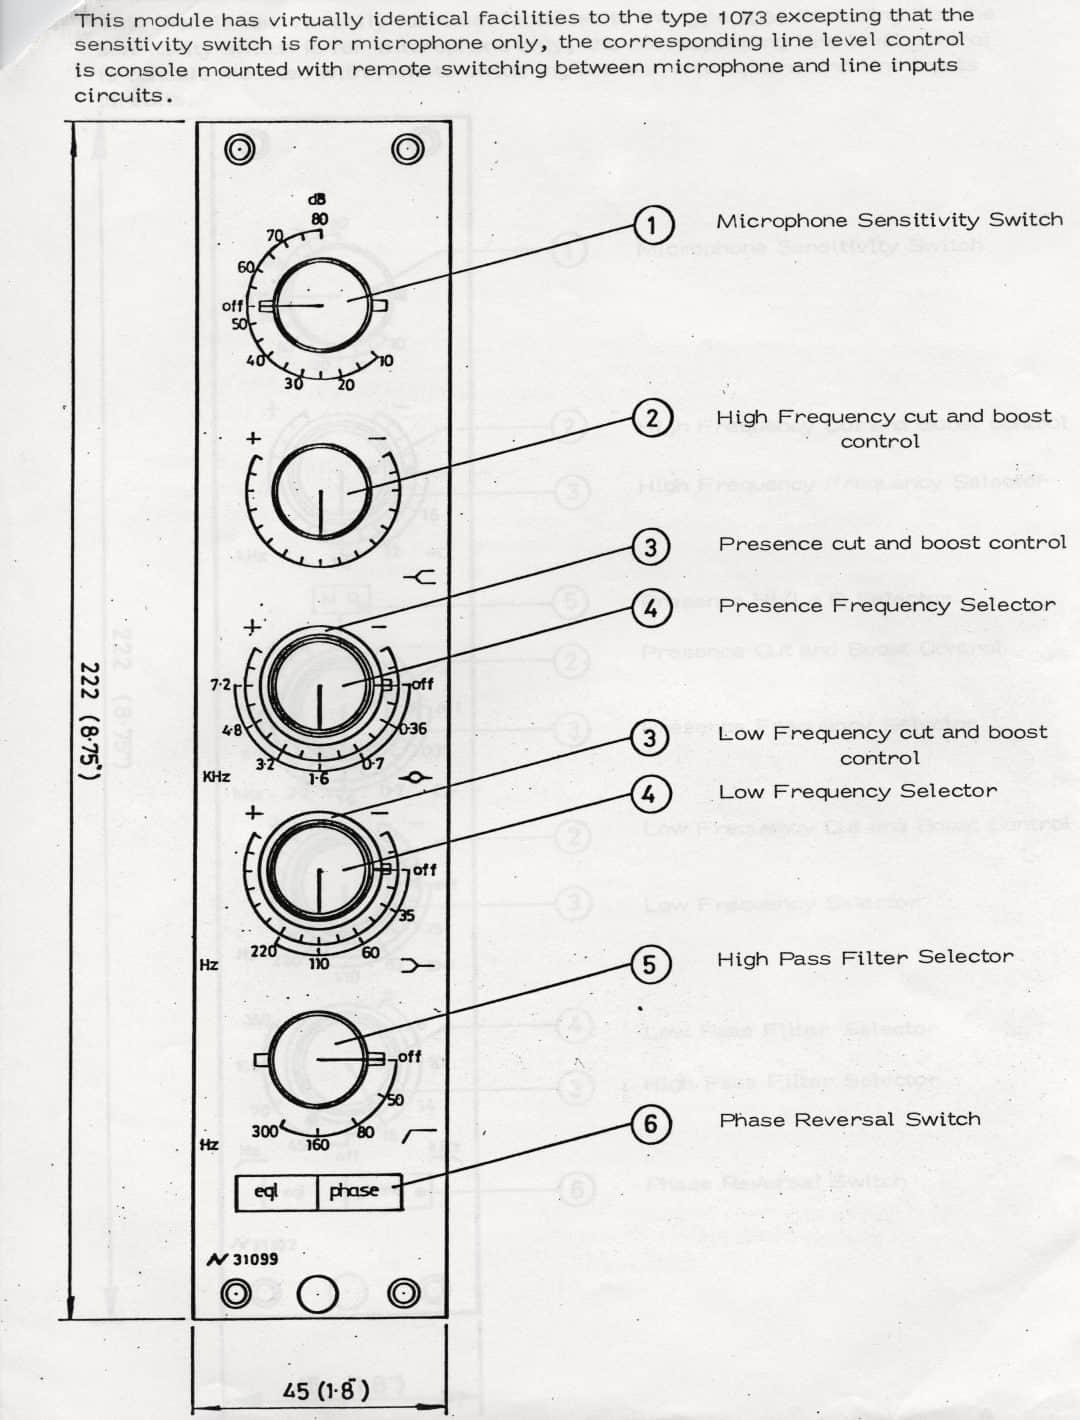 Neve 31099 Diagram